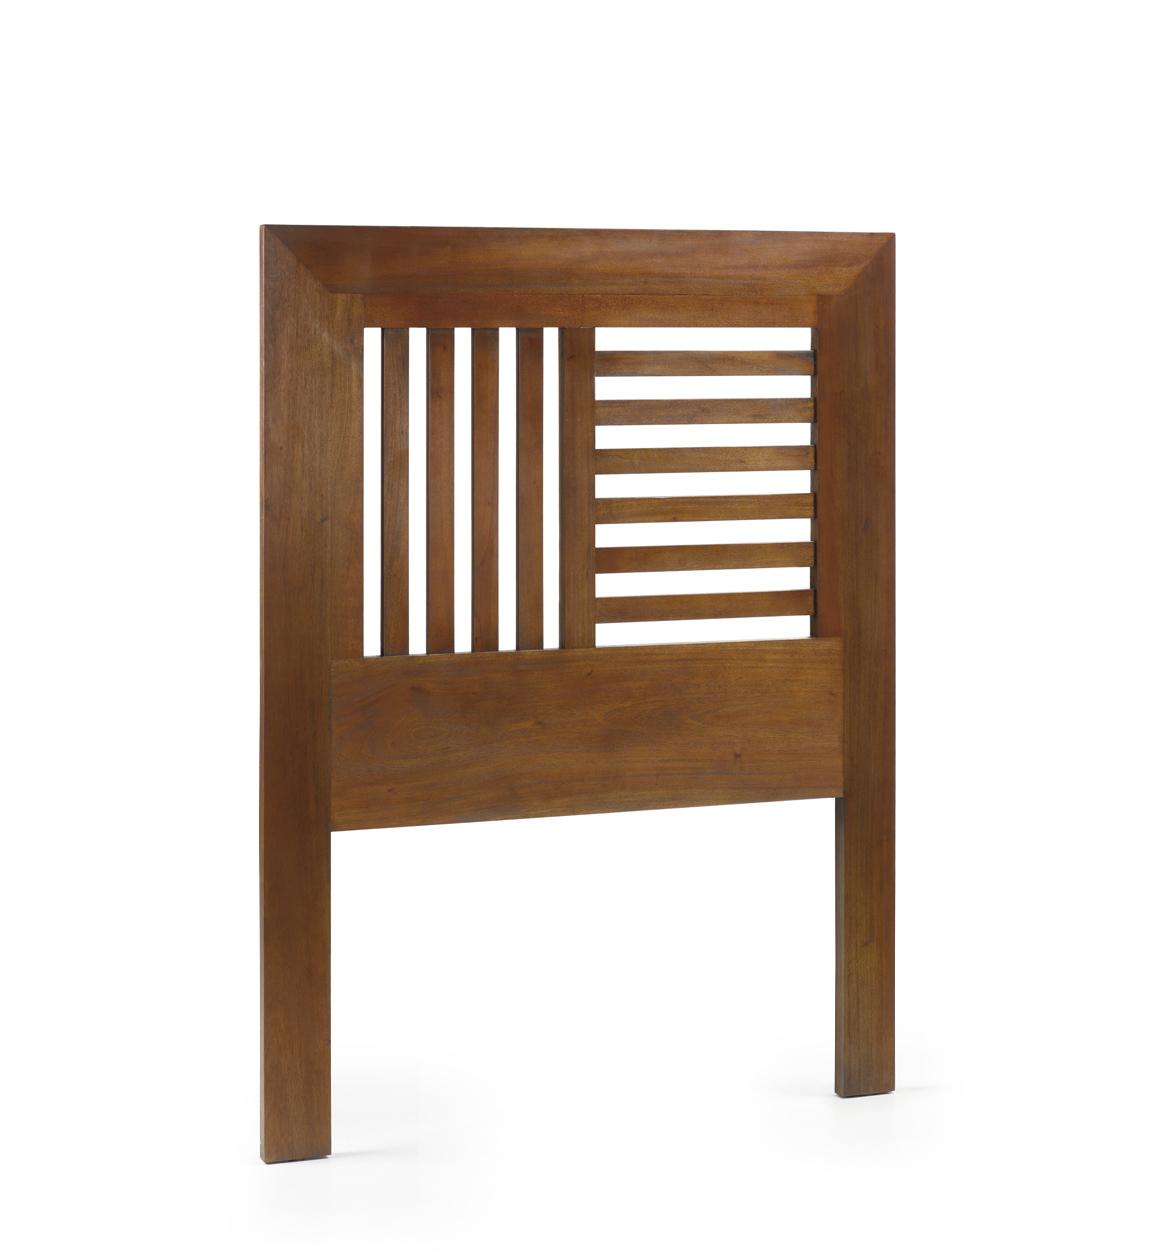 Tête de lit en bois marron